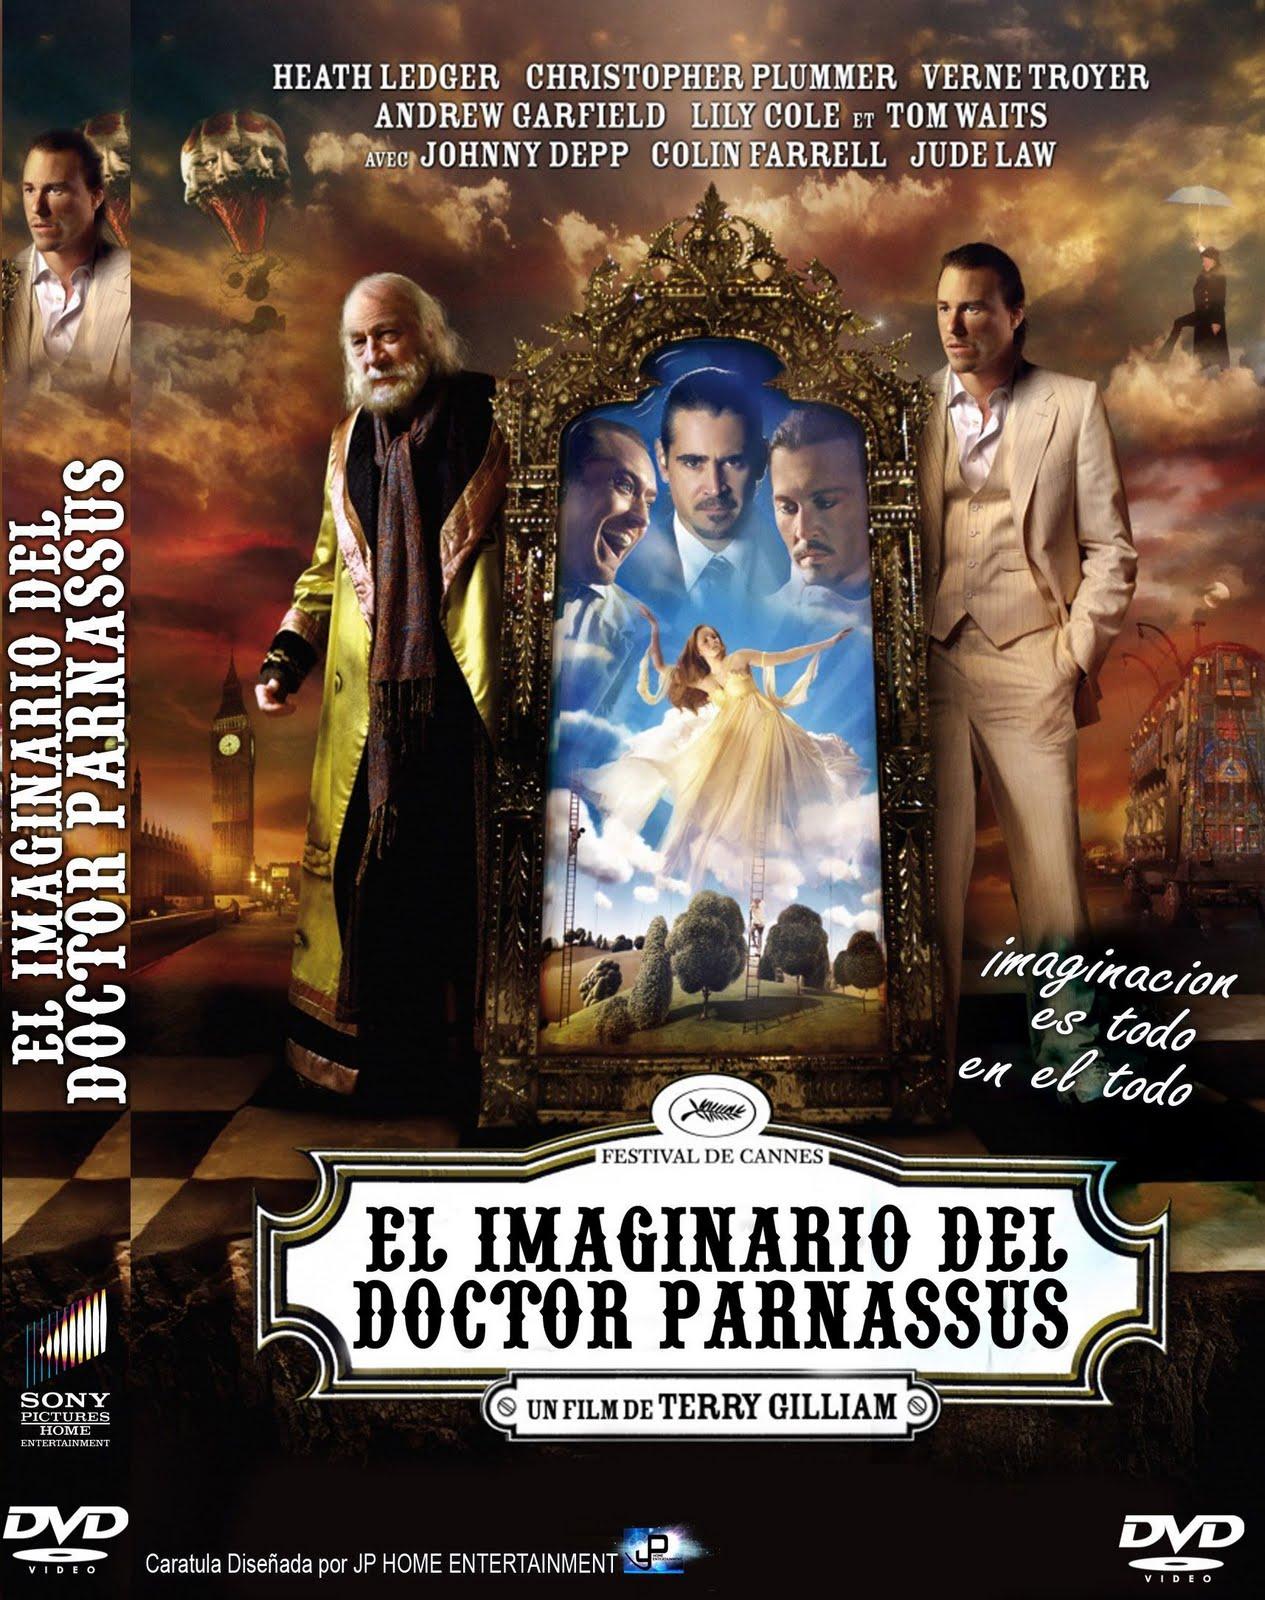 http://3.bp.blogspot.com/_UjwQQdveCmE/S7FasBrnjtI/AAAAAAAADI4/8UMGykiaBdI/s1600/El+Imaginario+Del+Doctor+Parnassus.jpg